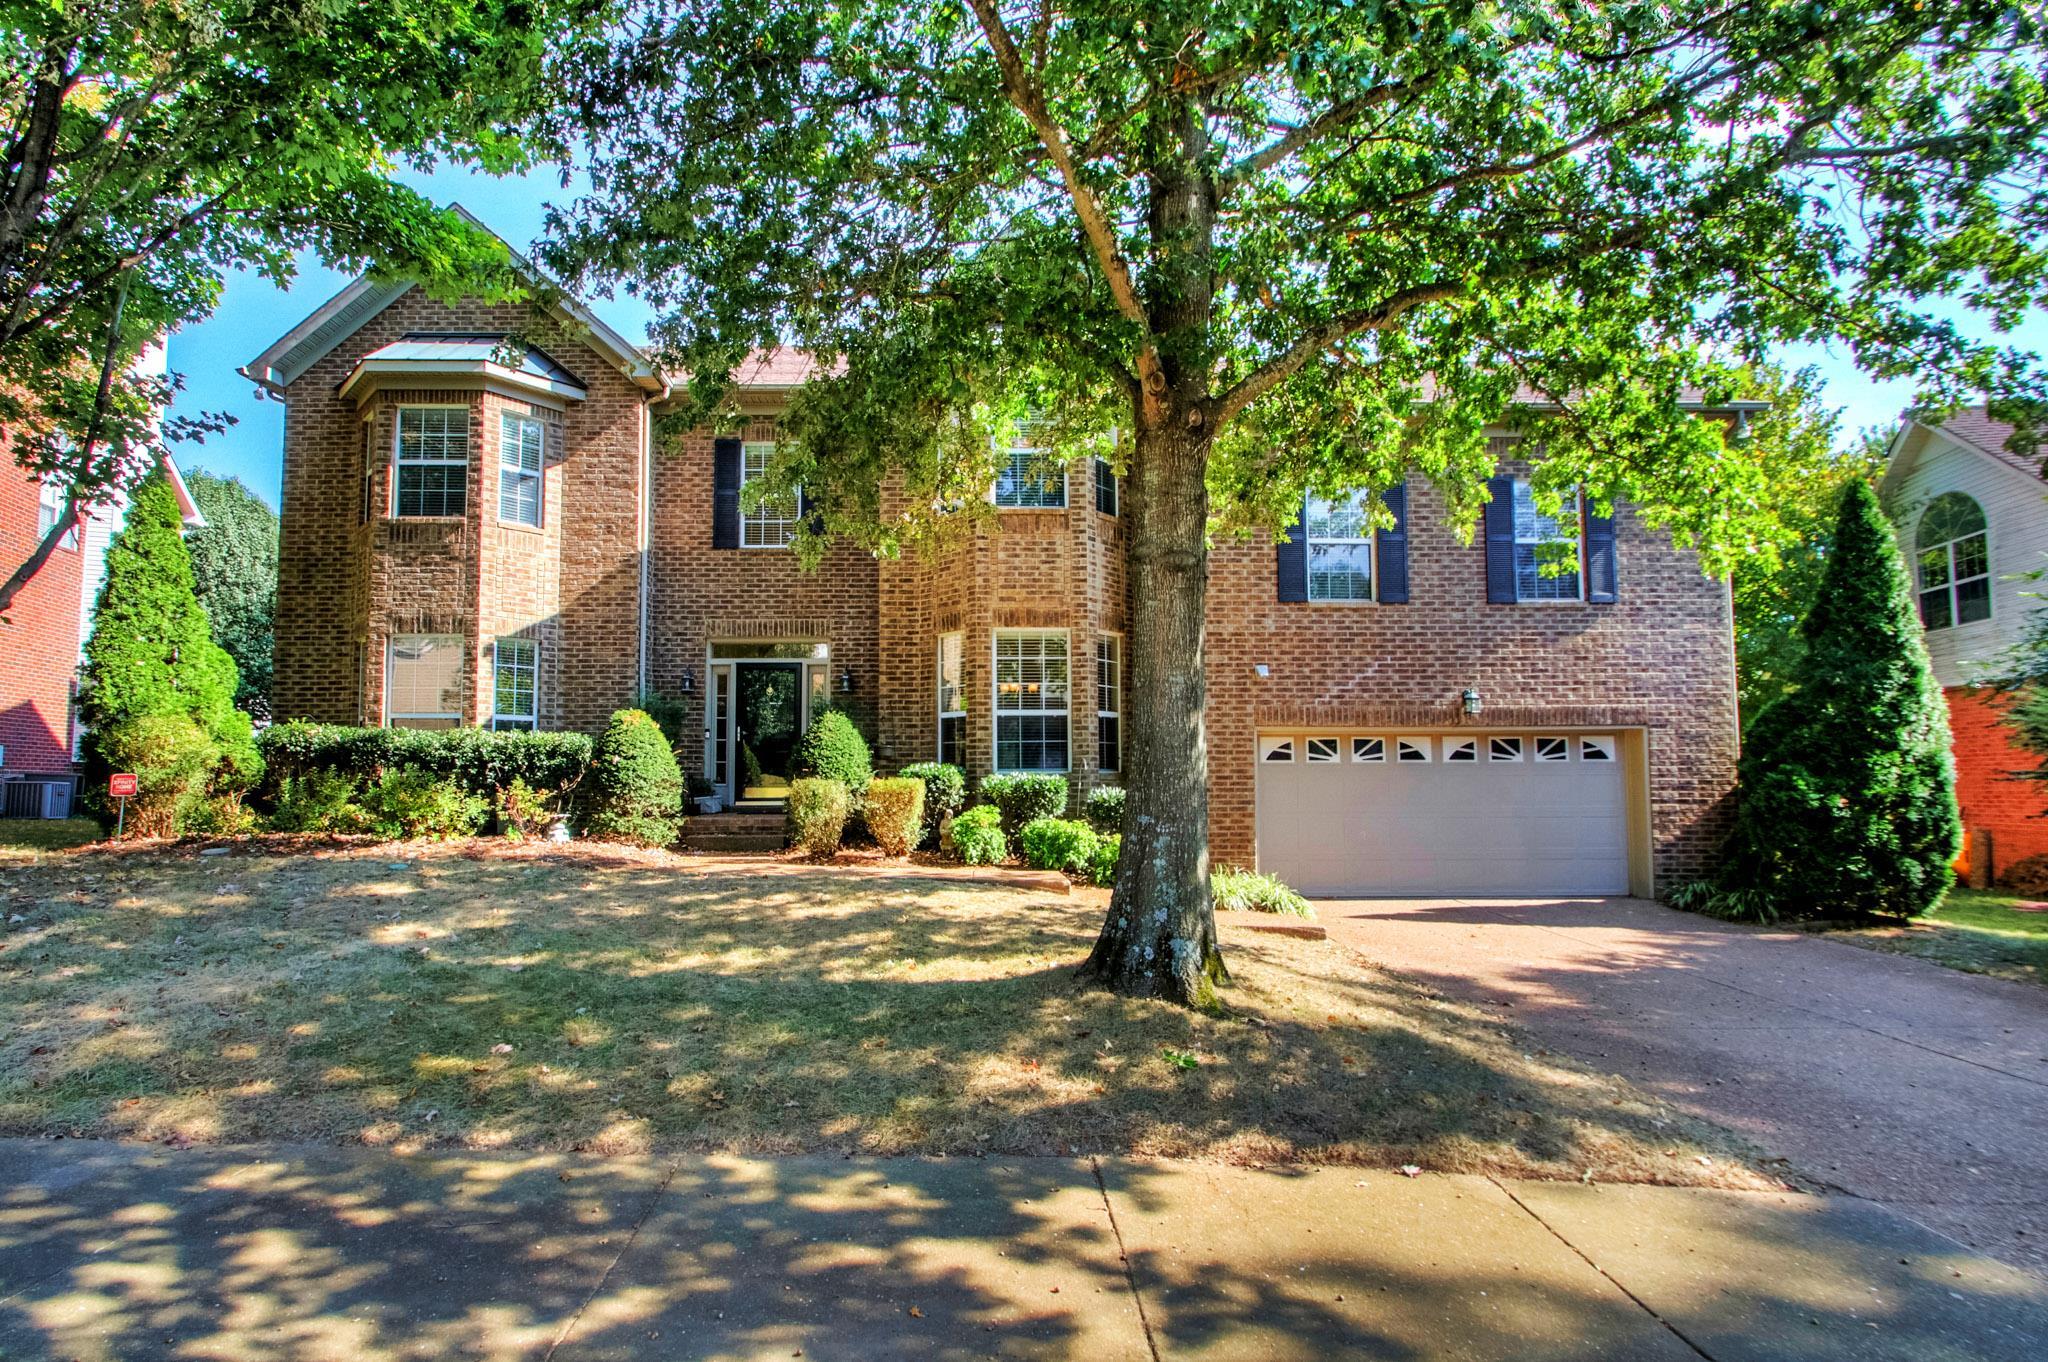 612 Grange Hill Ct, Franklin, TN 37067 - Franklin, TN real estate listing